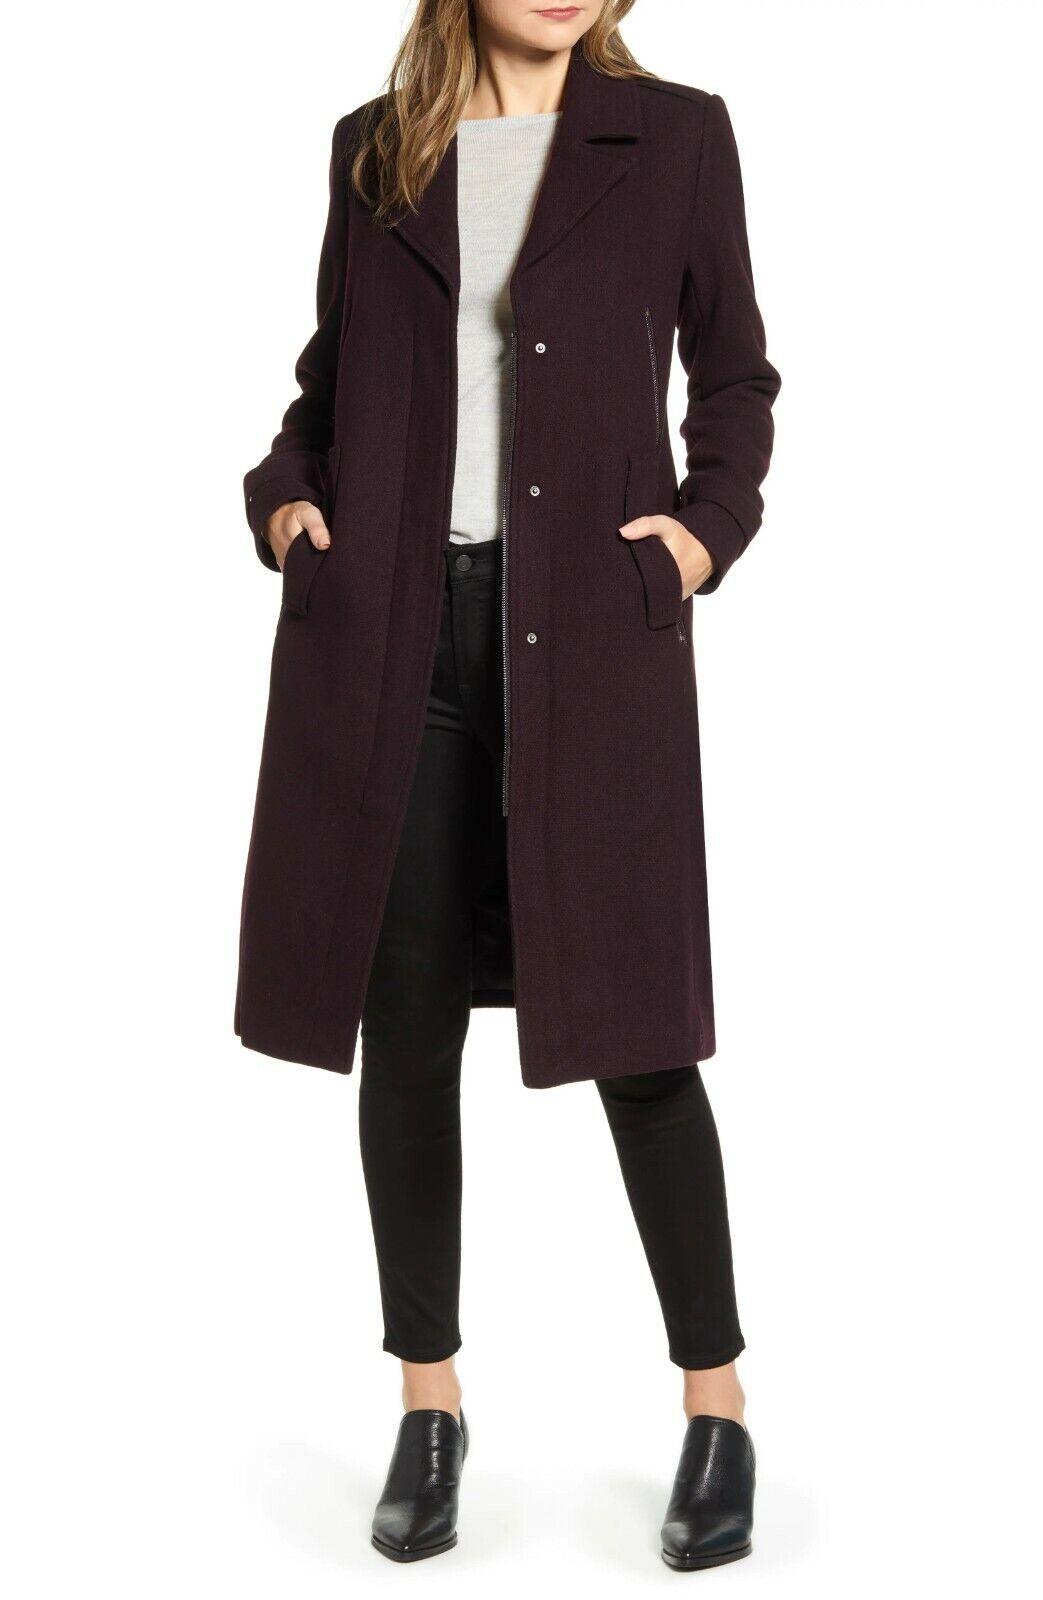 NWOT Marc New York Wool Blend Melton Coat 2